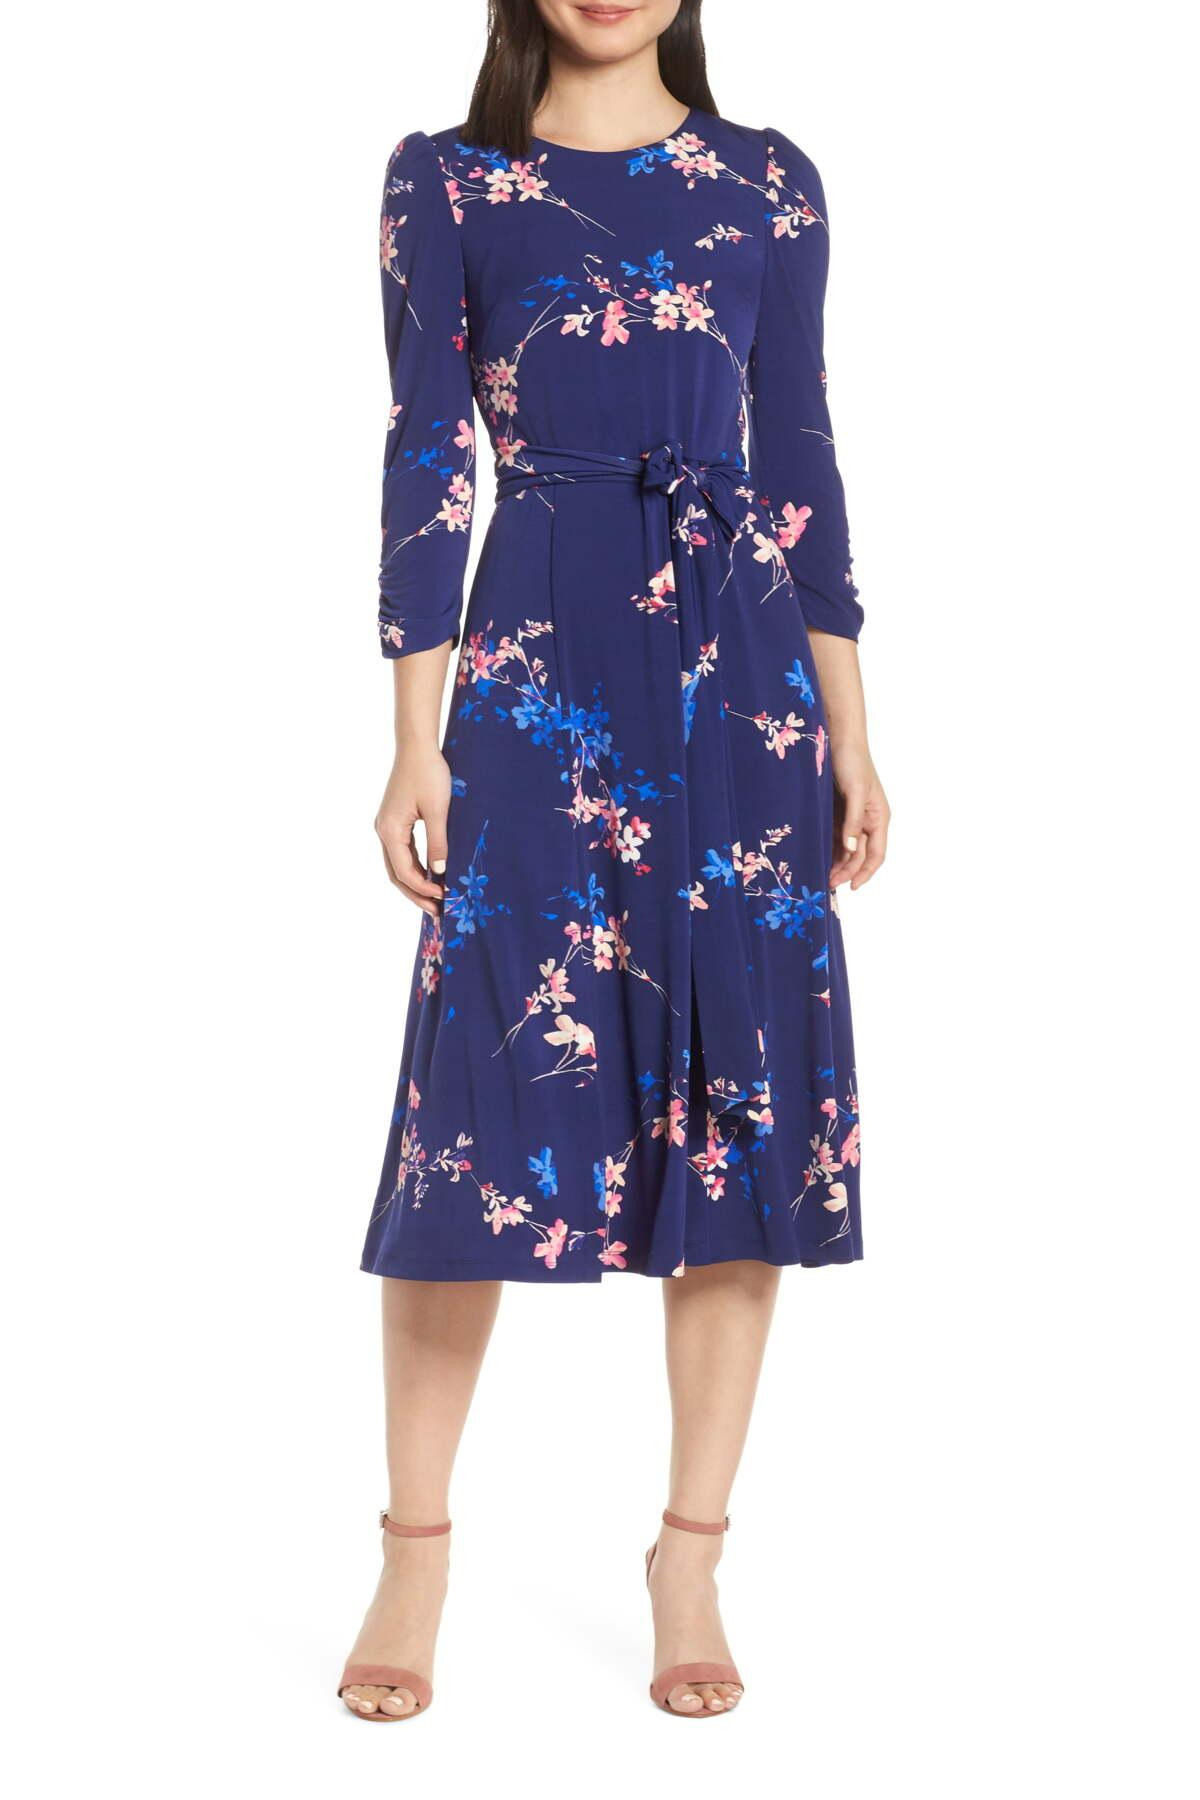 Eliza j floral long sleeve bodycon midi dress